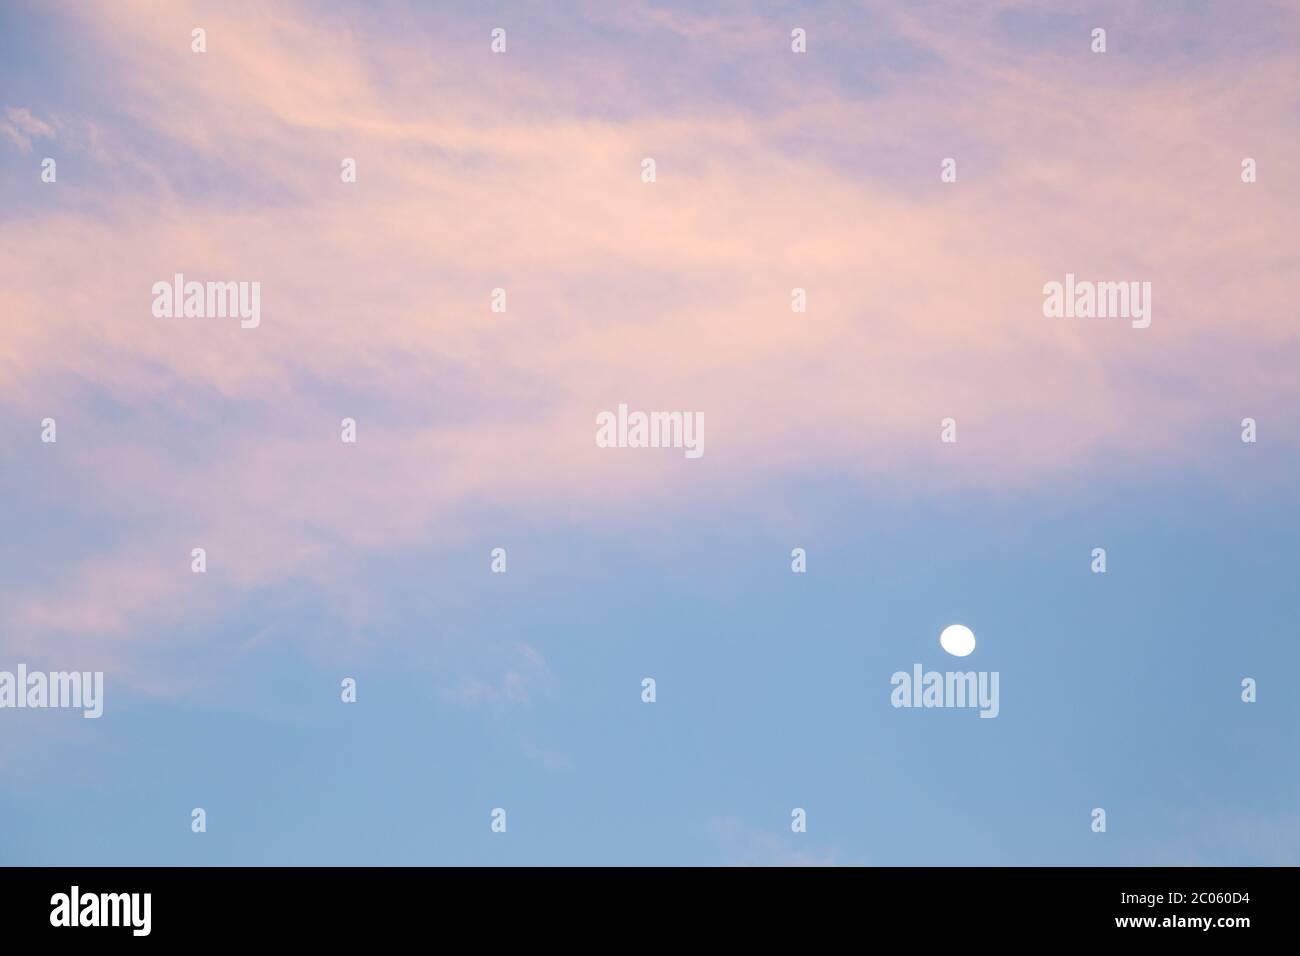 Twilight Blue Purple Sunset Sky Background Stock Photo Alamy